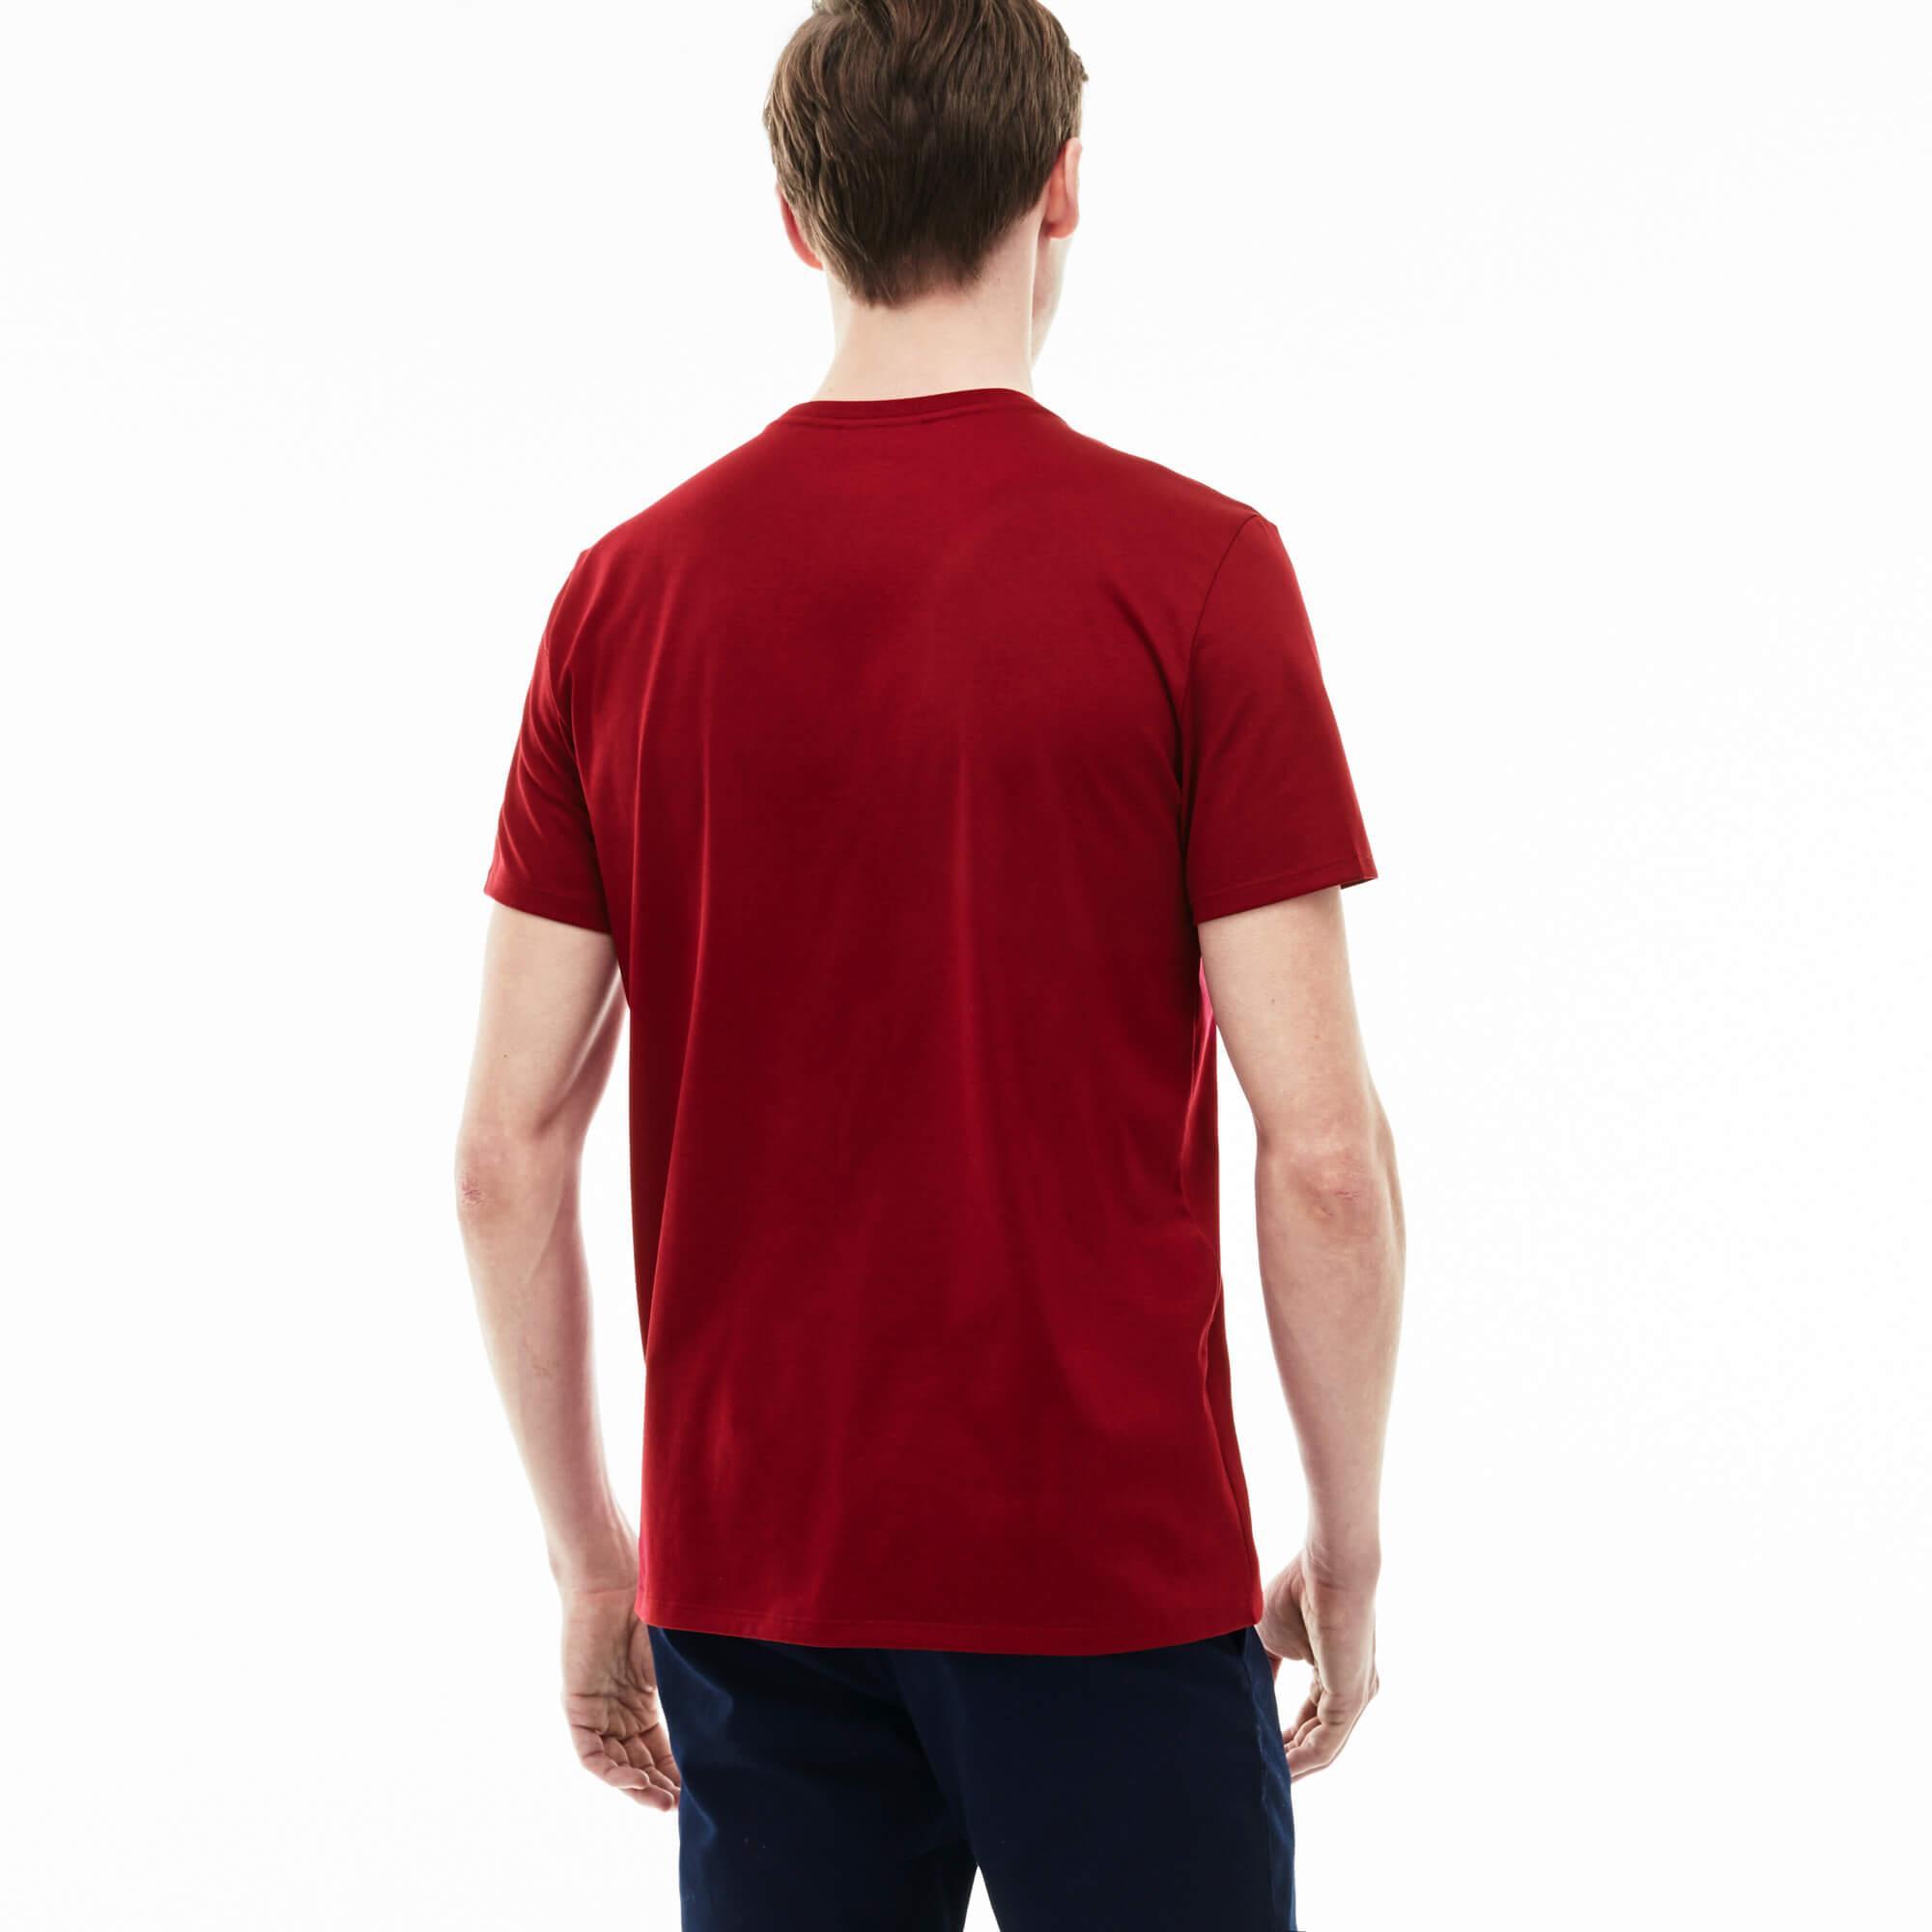 Lacoste Erkek Regular Fit V Yaka Bordo T-Shirt